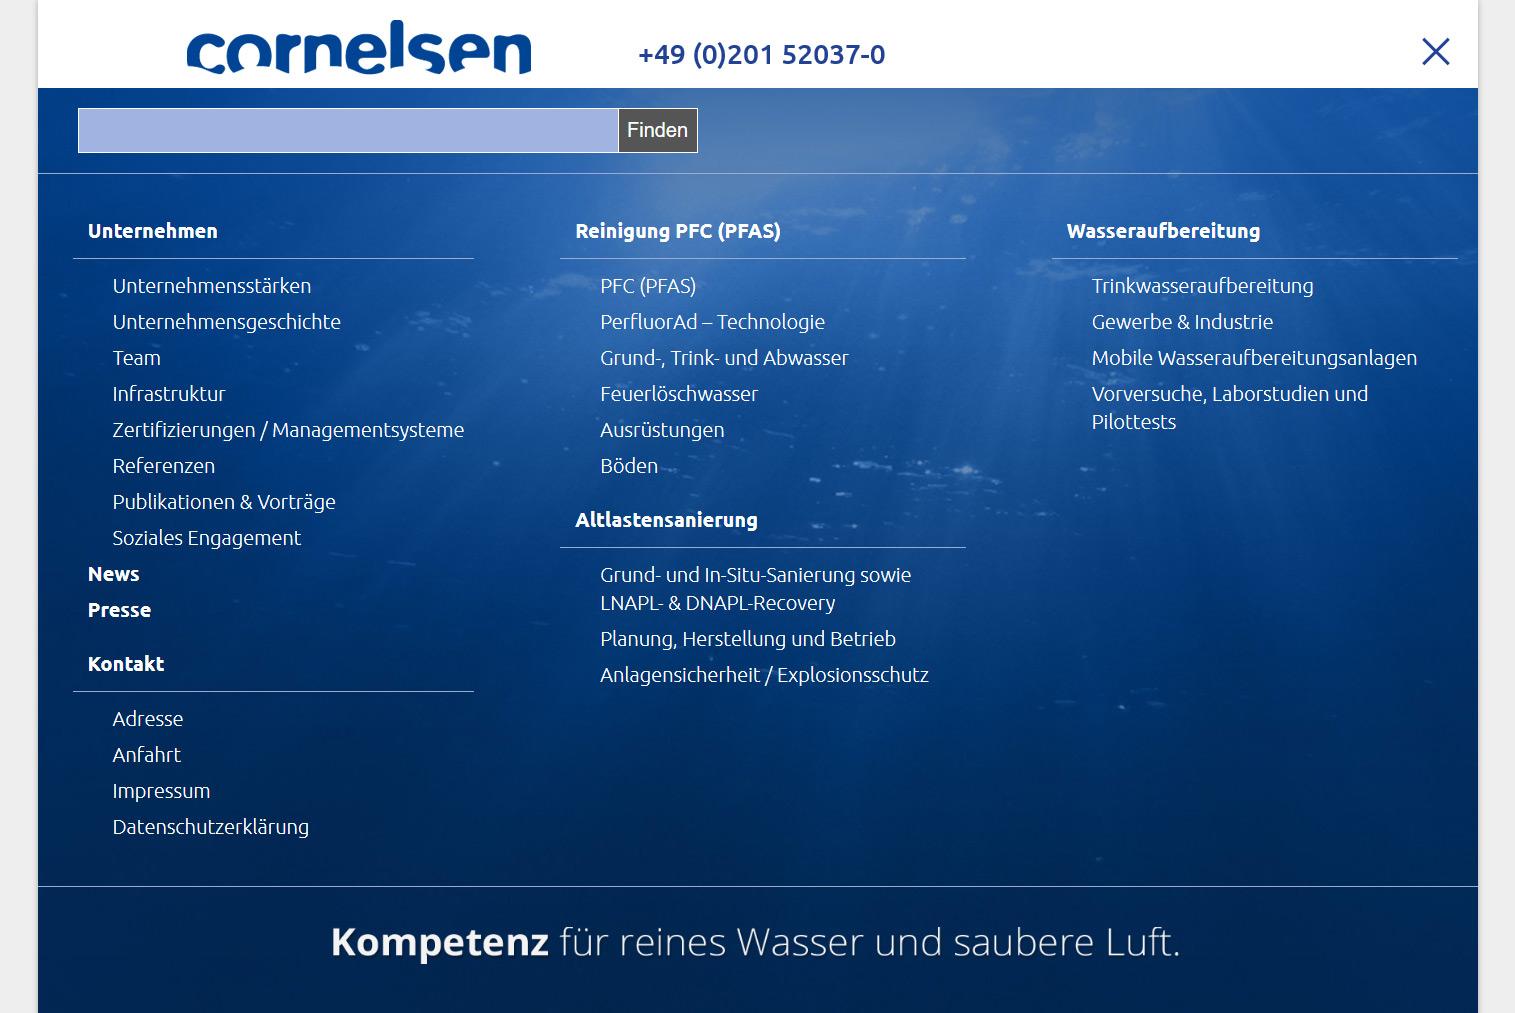 webdesign-agentur designbetrieb relauncht www.cornelsen-umwelt.de